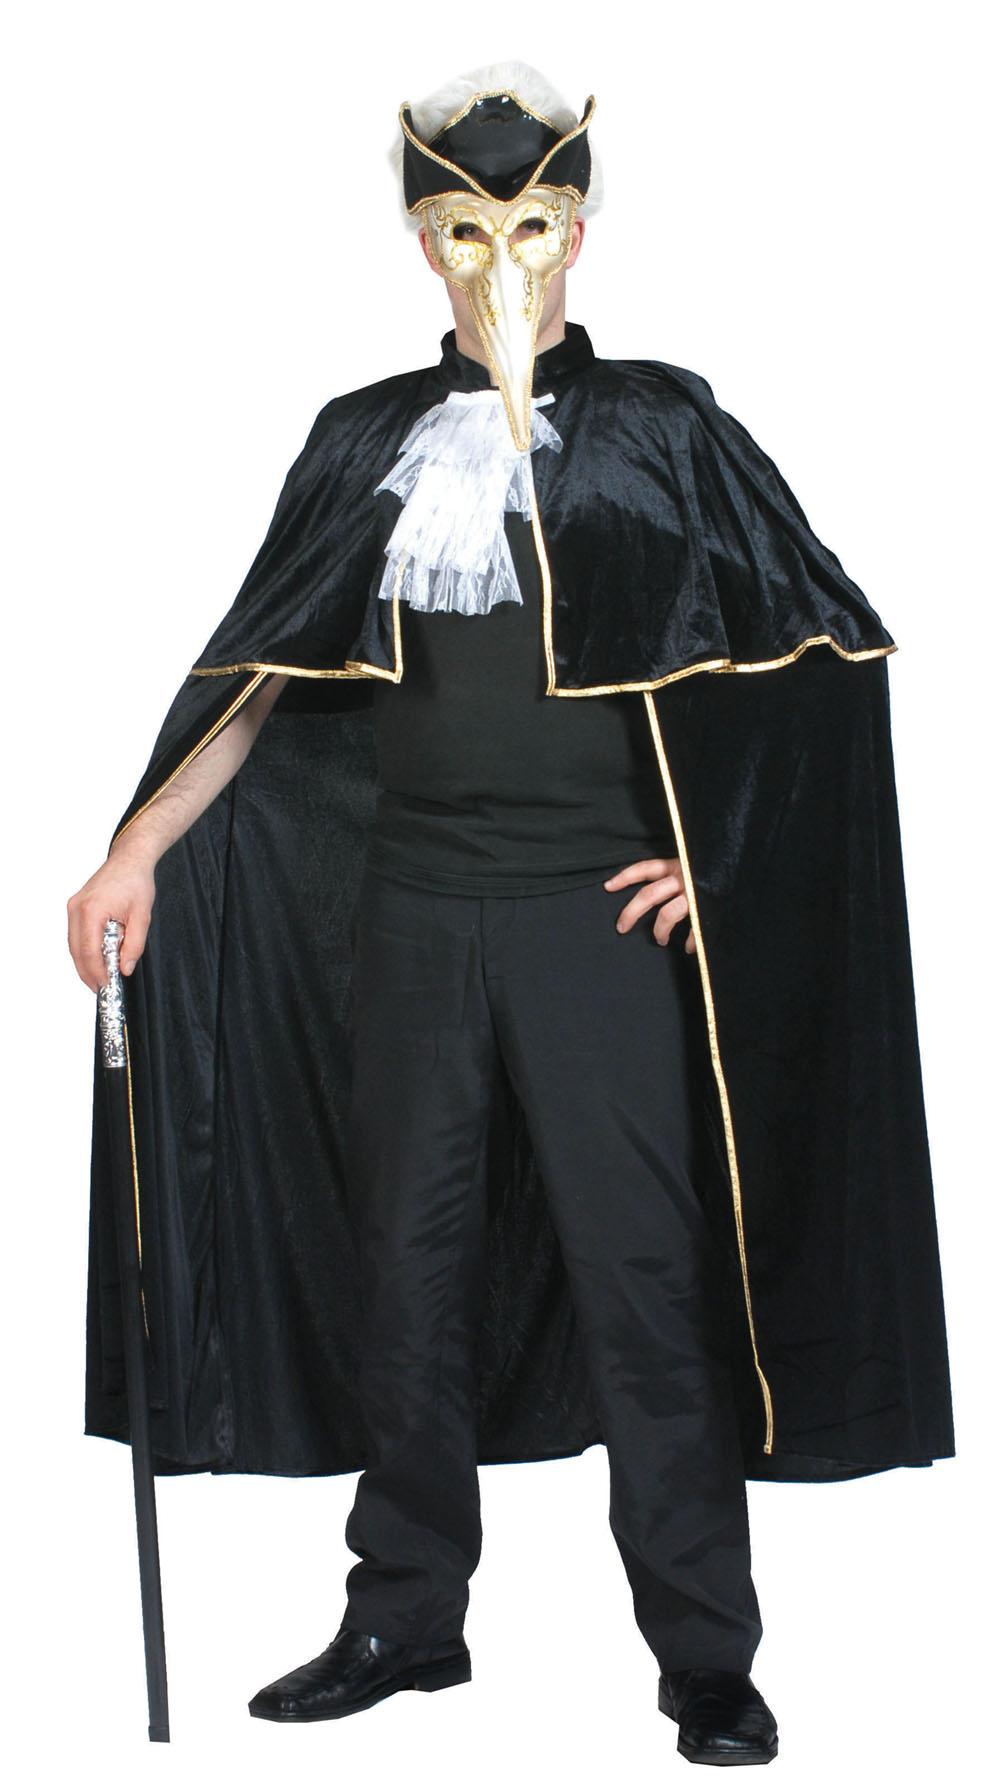 Venetian Cape Fancy Dress Costume Masquerade Ball Phantom Halloween Outfit Party